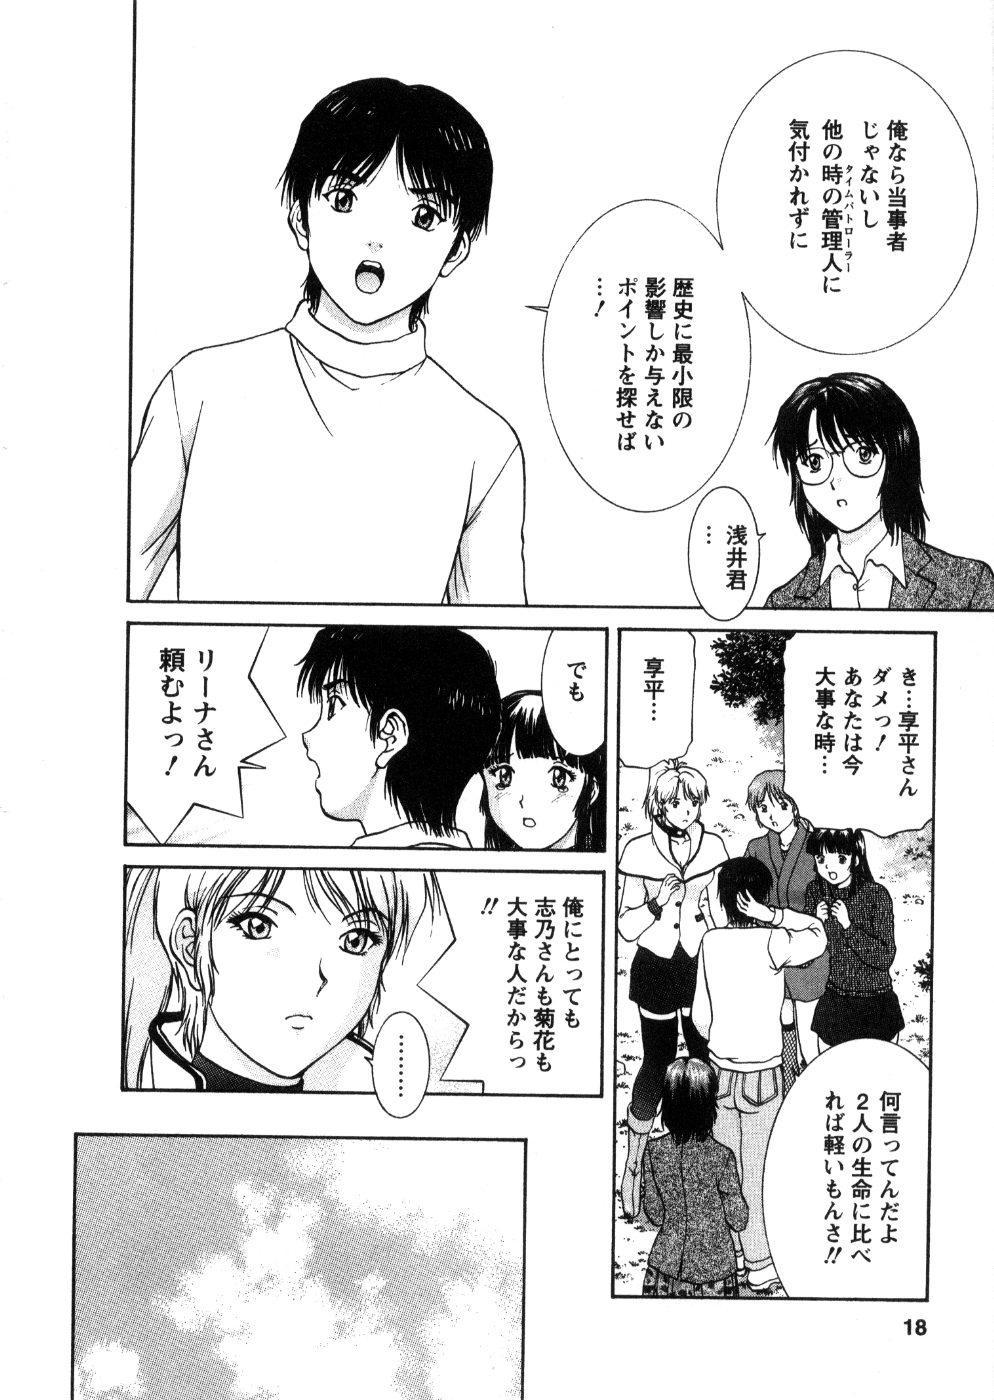 Oneechan-tachi ga Yatte Kuru 03 19